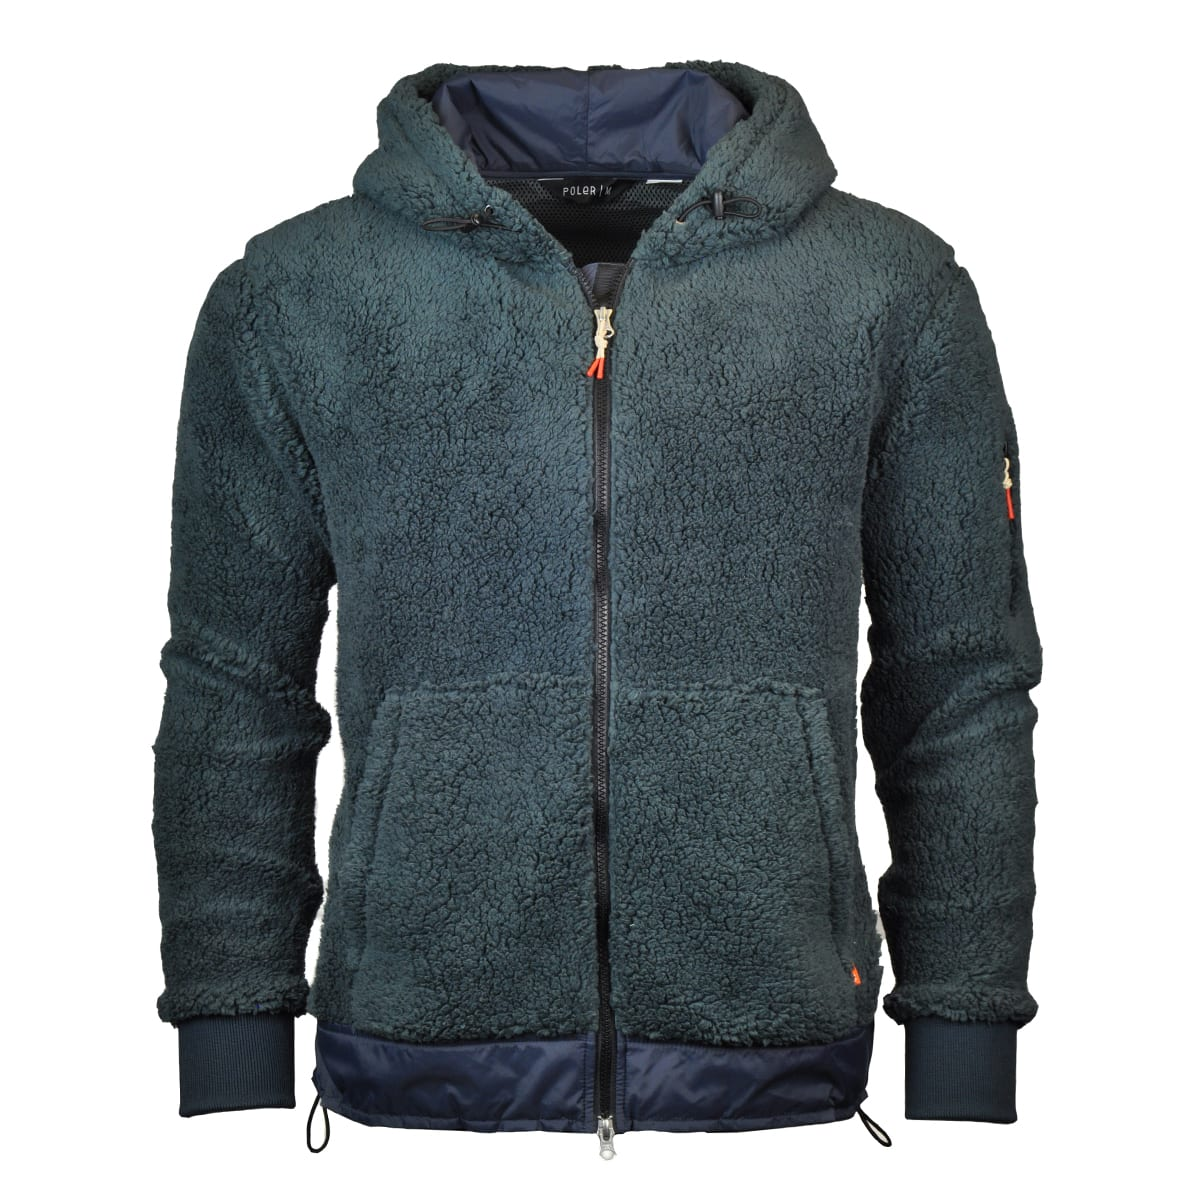 Poler Shaggy Fleece Full Zip Hooded Jacket - The Sporting Lodge